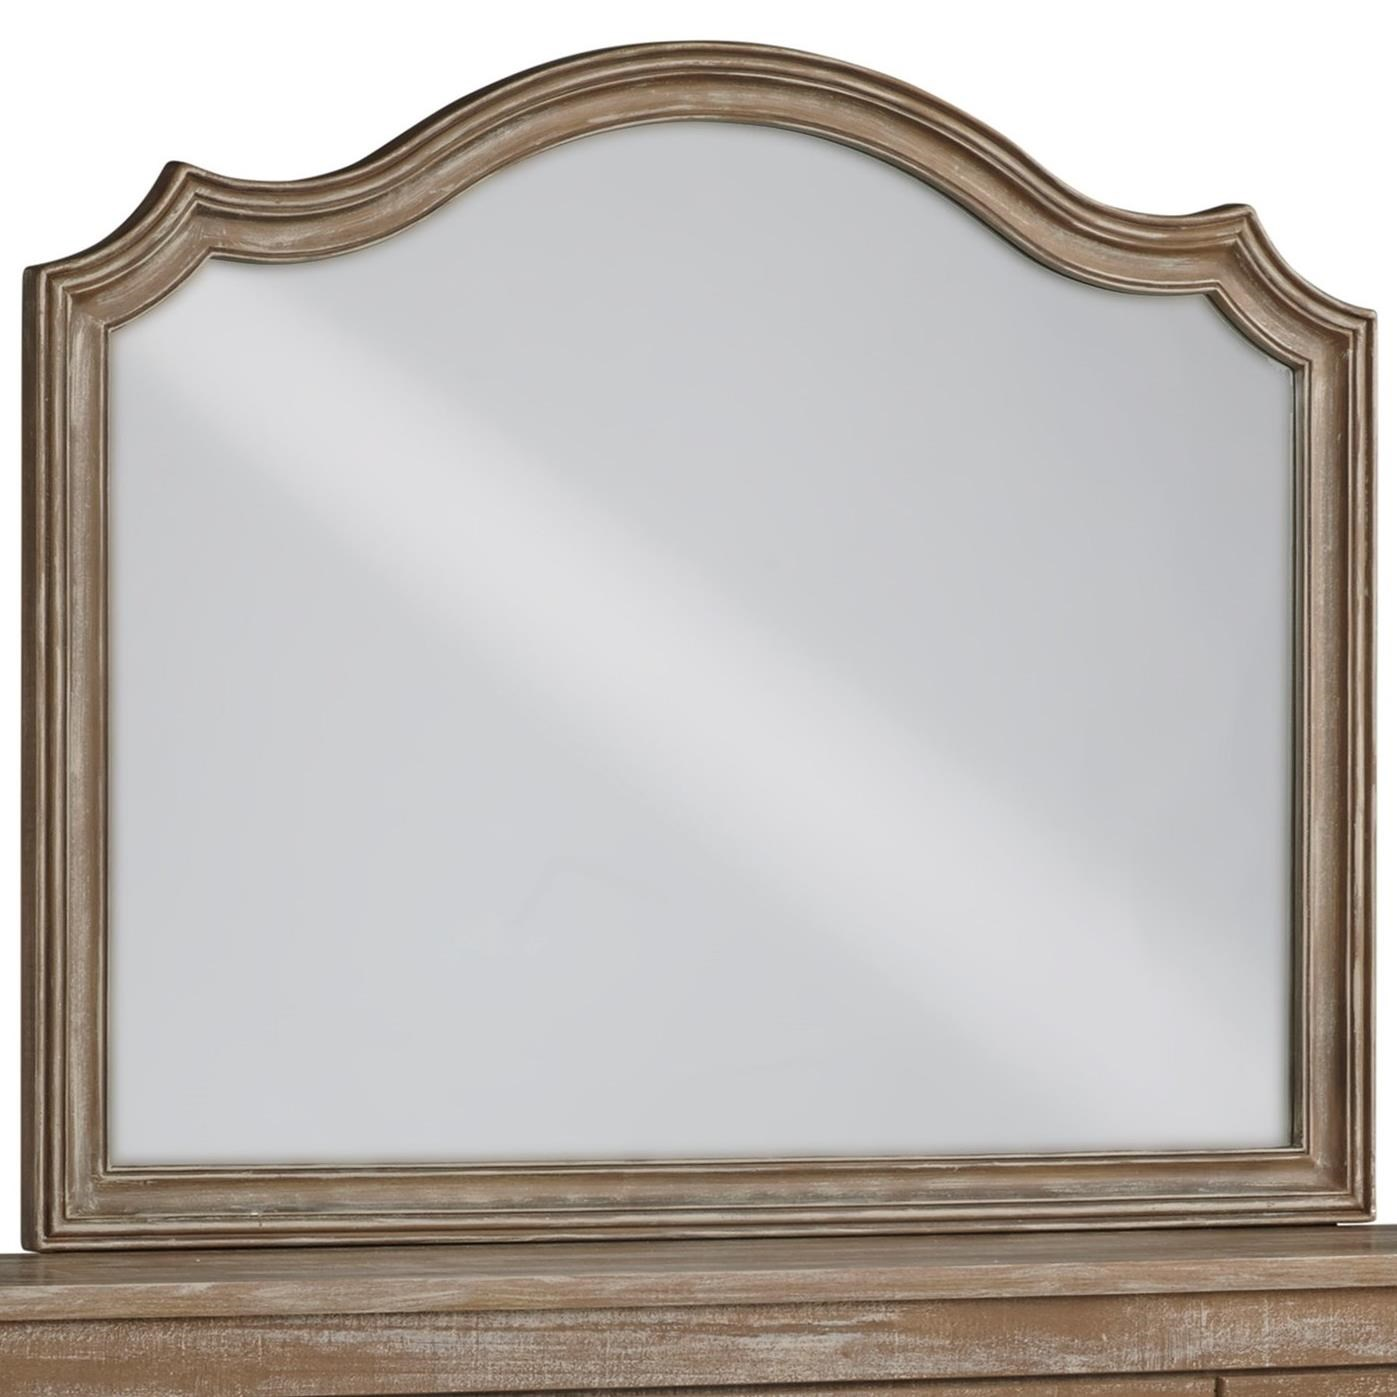 Signature Design by Ashley Shellington Bedroom Mirror - Item Number: B336-36